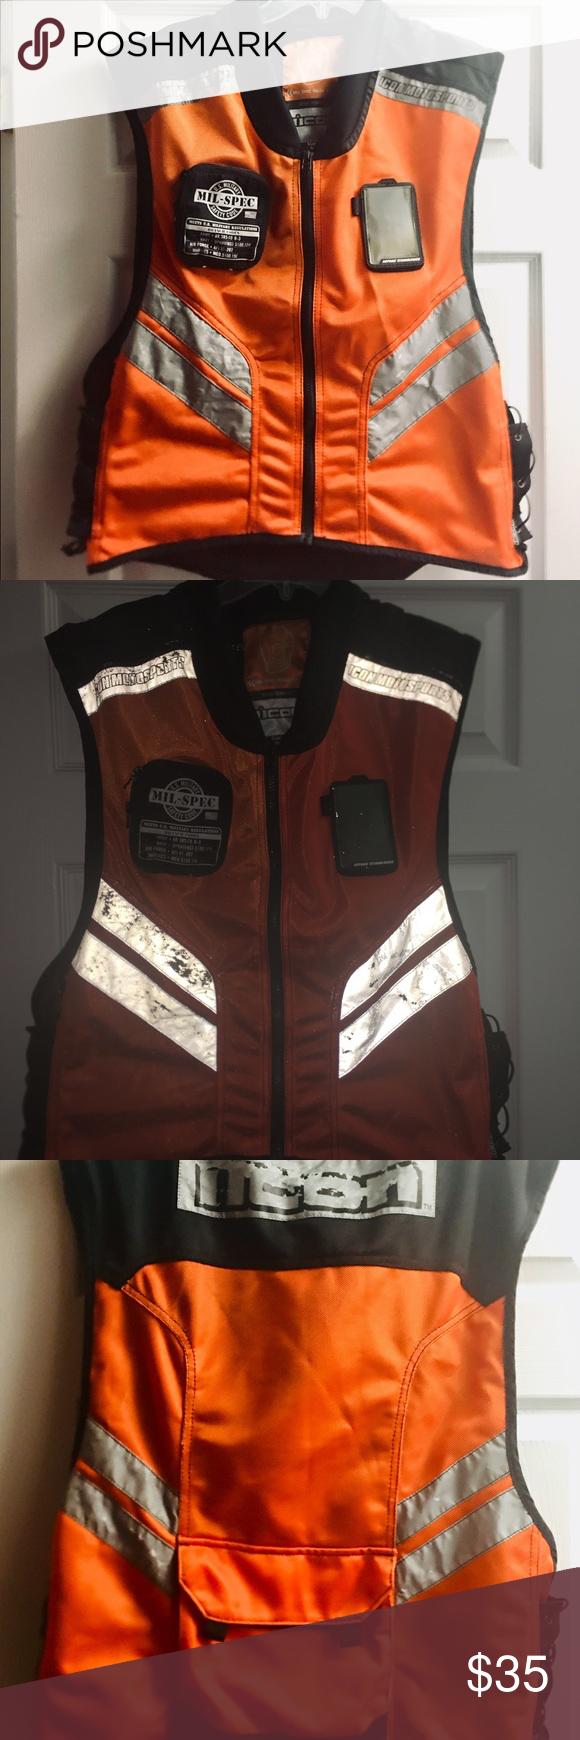 Icon Motosport MilSpec Mesh Vest Icon jackets, Clothes